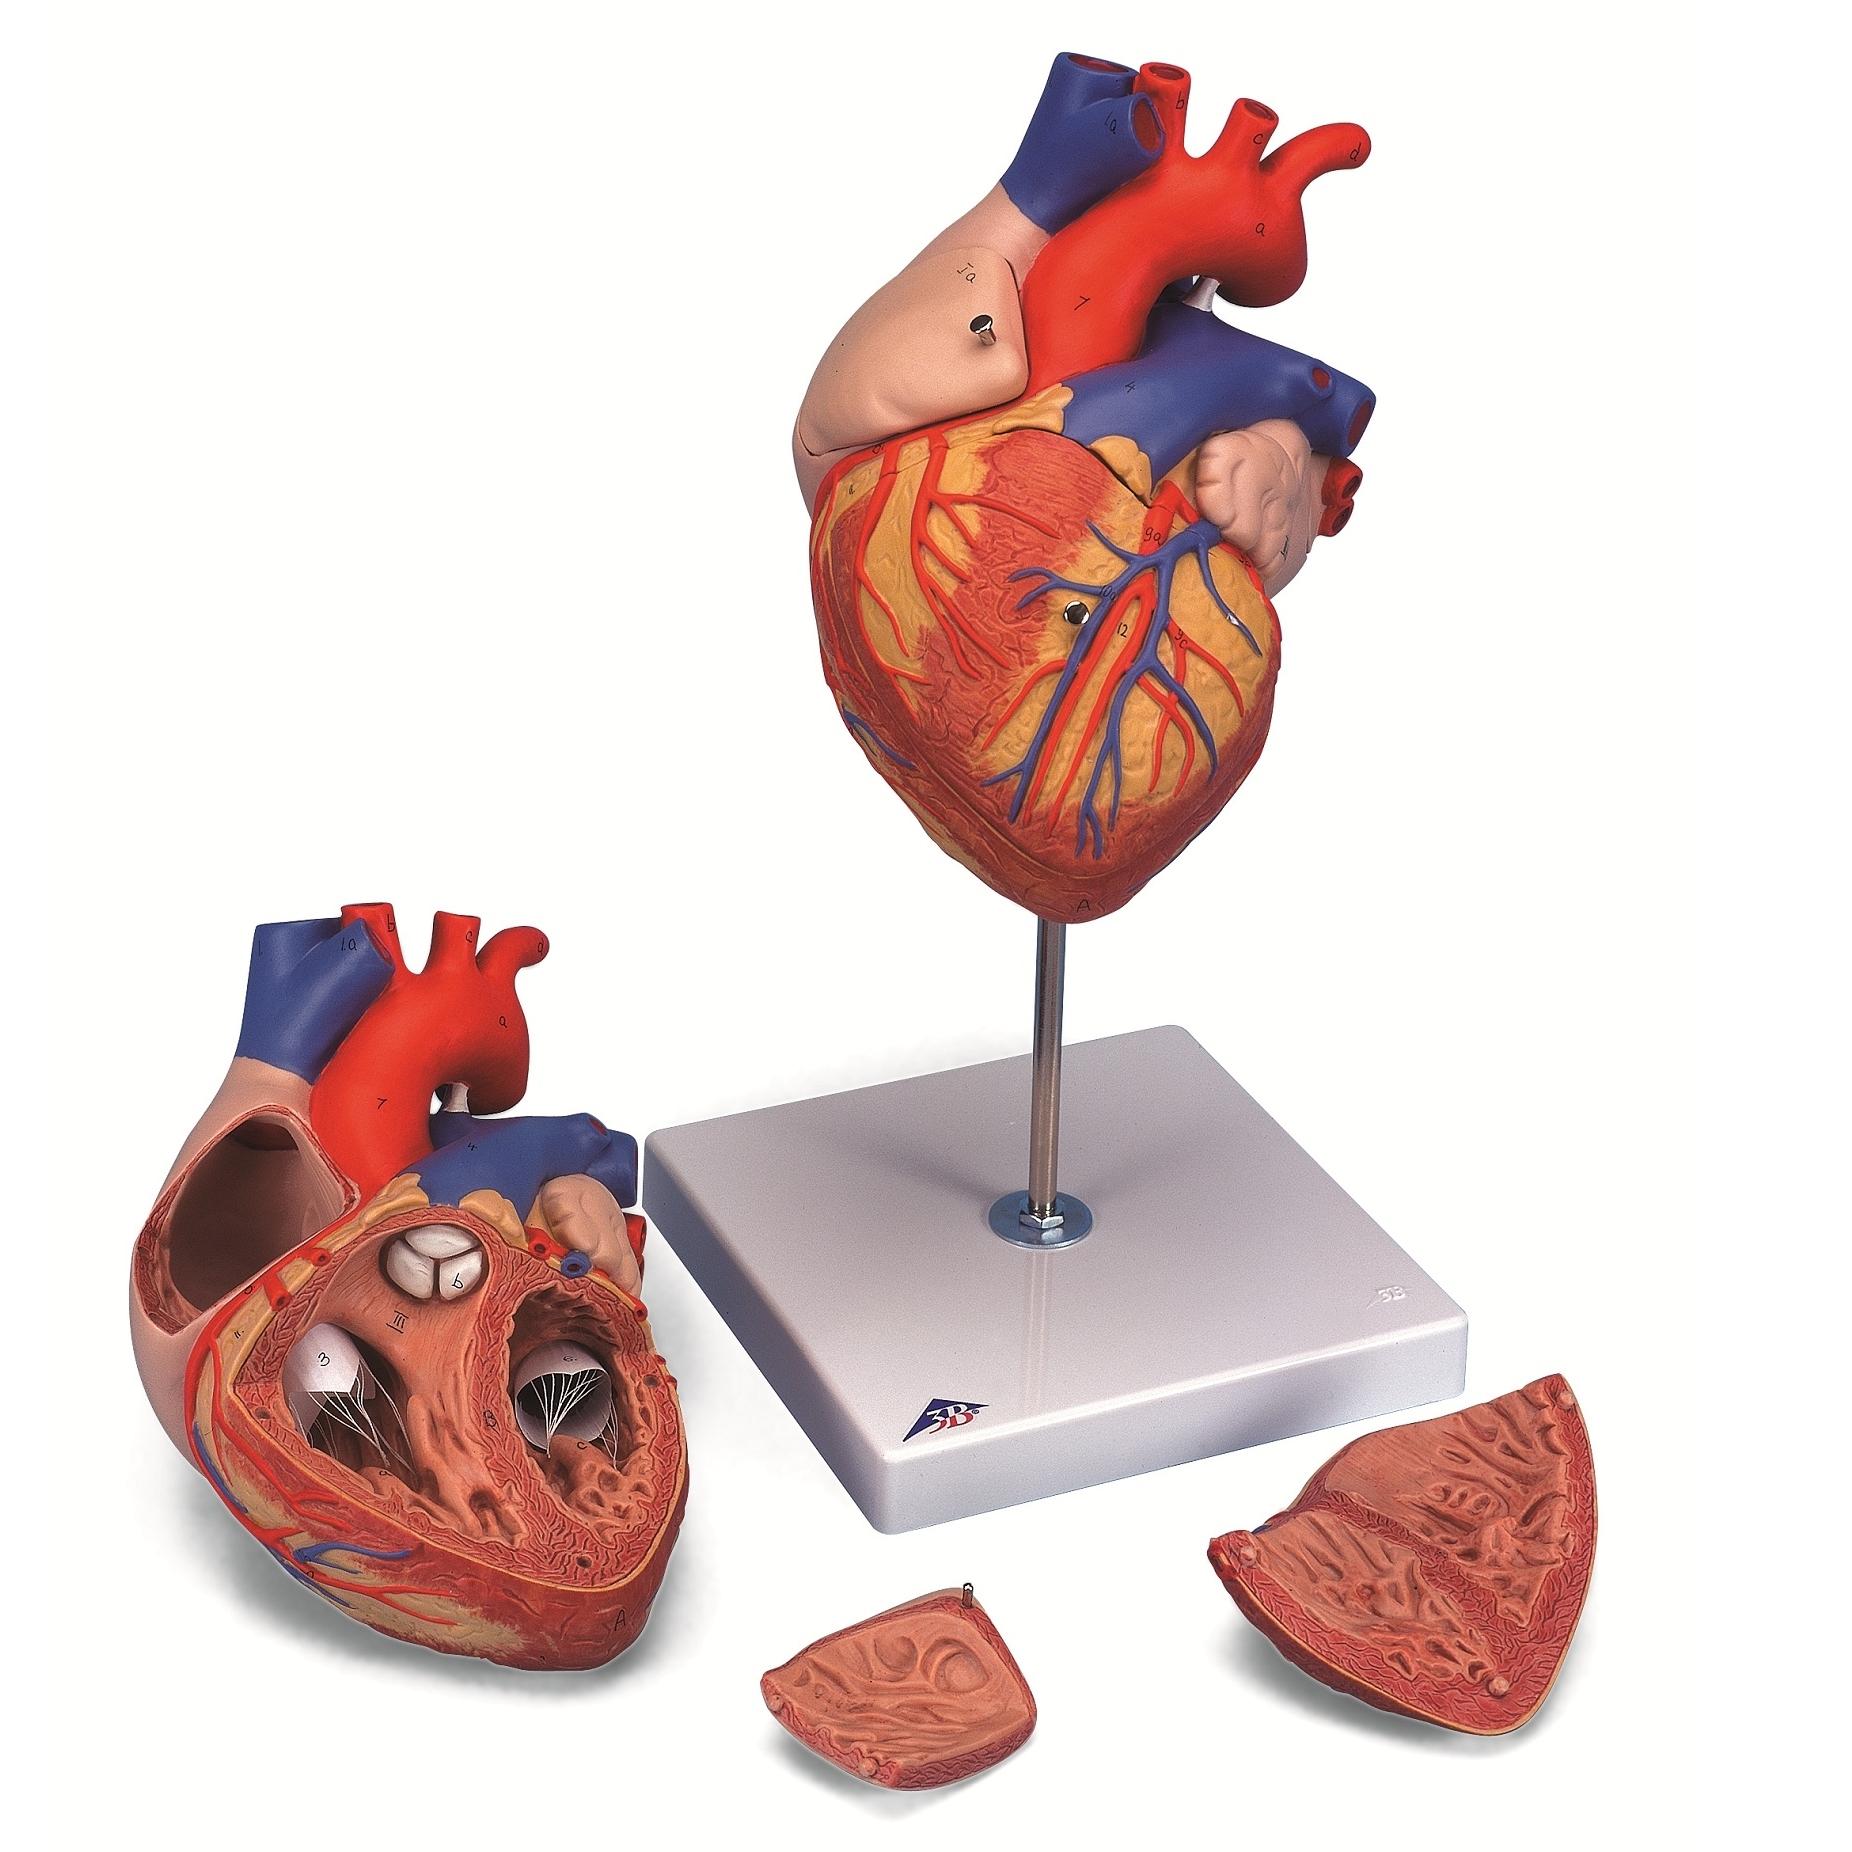 sveikatos ligos ir būklės širdis dieta esant aukštai hipertenzijai